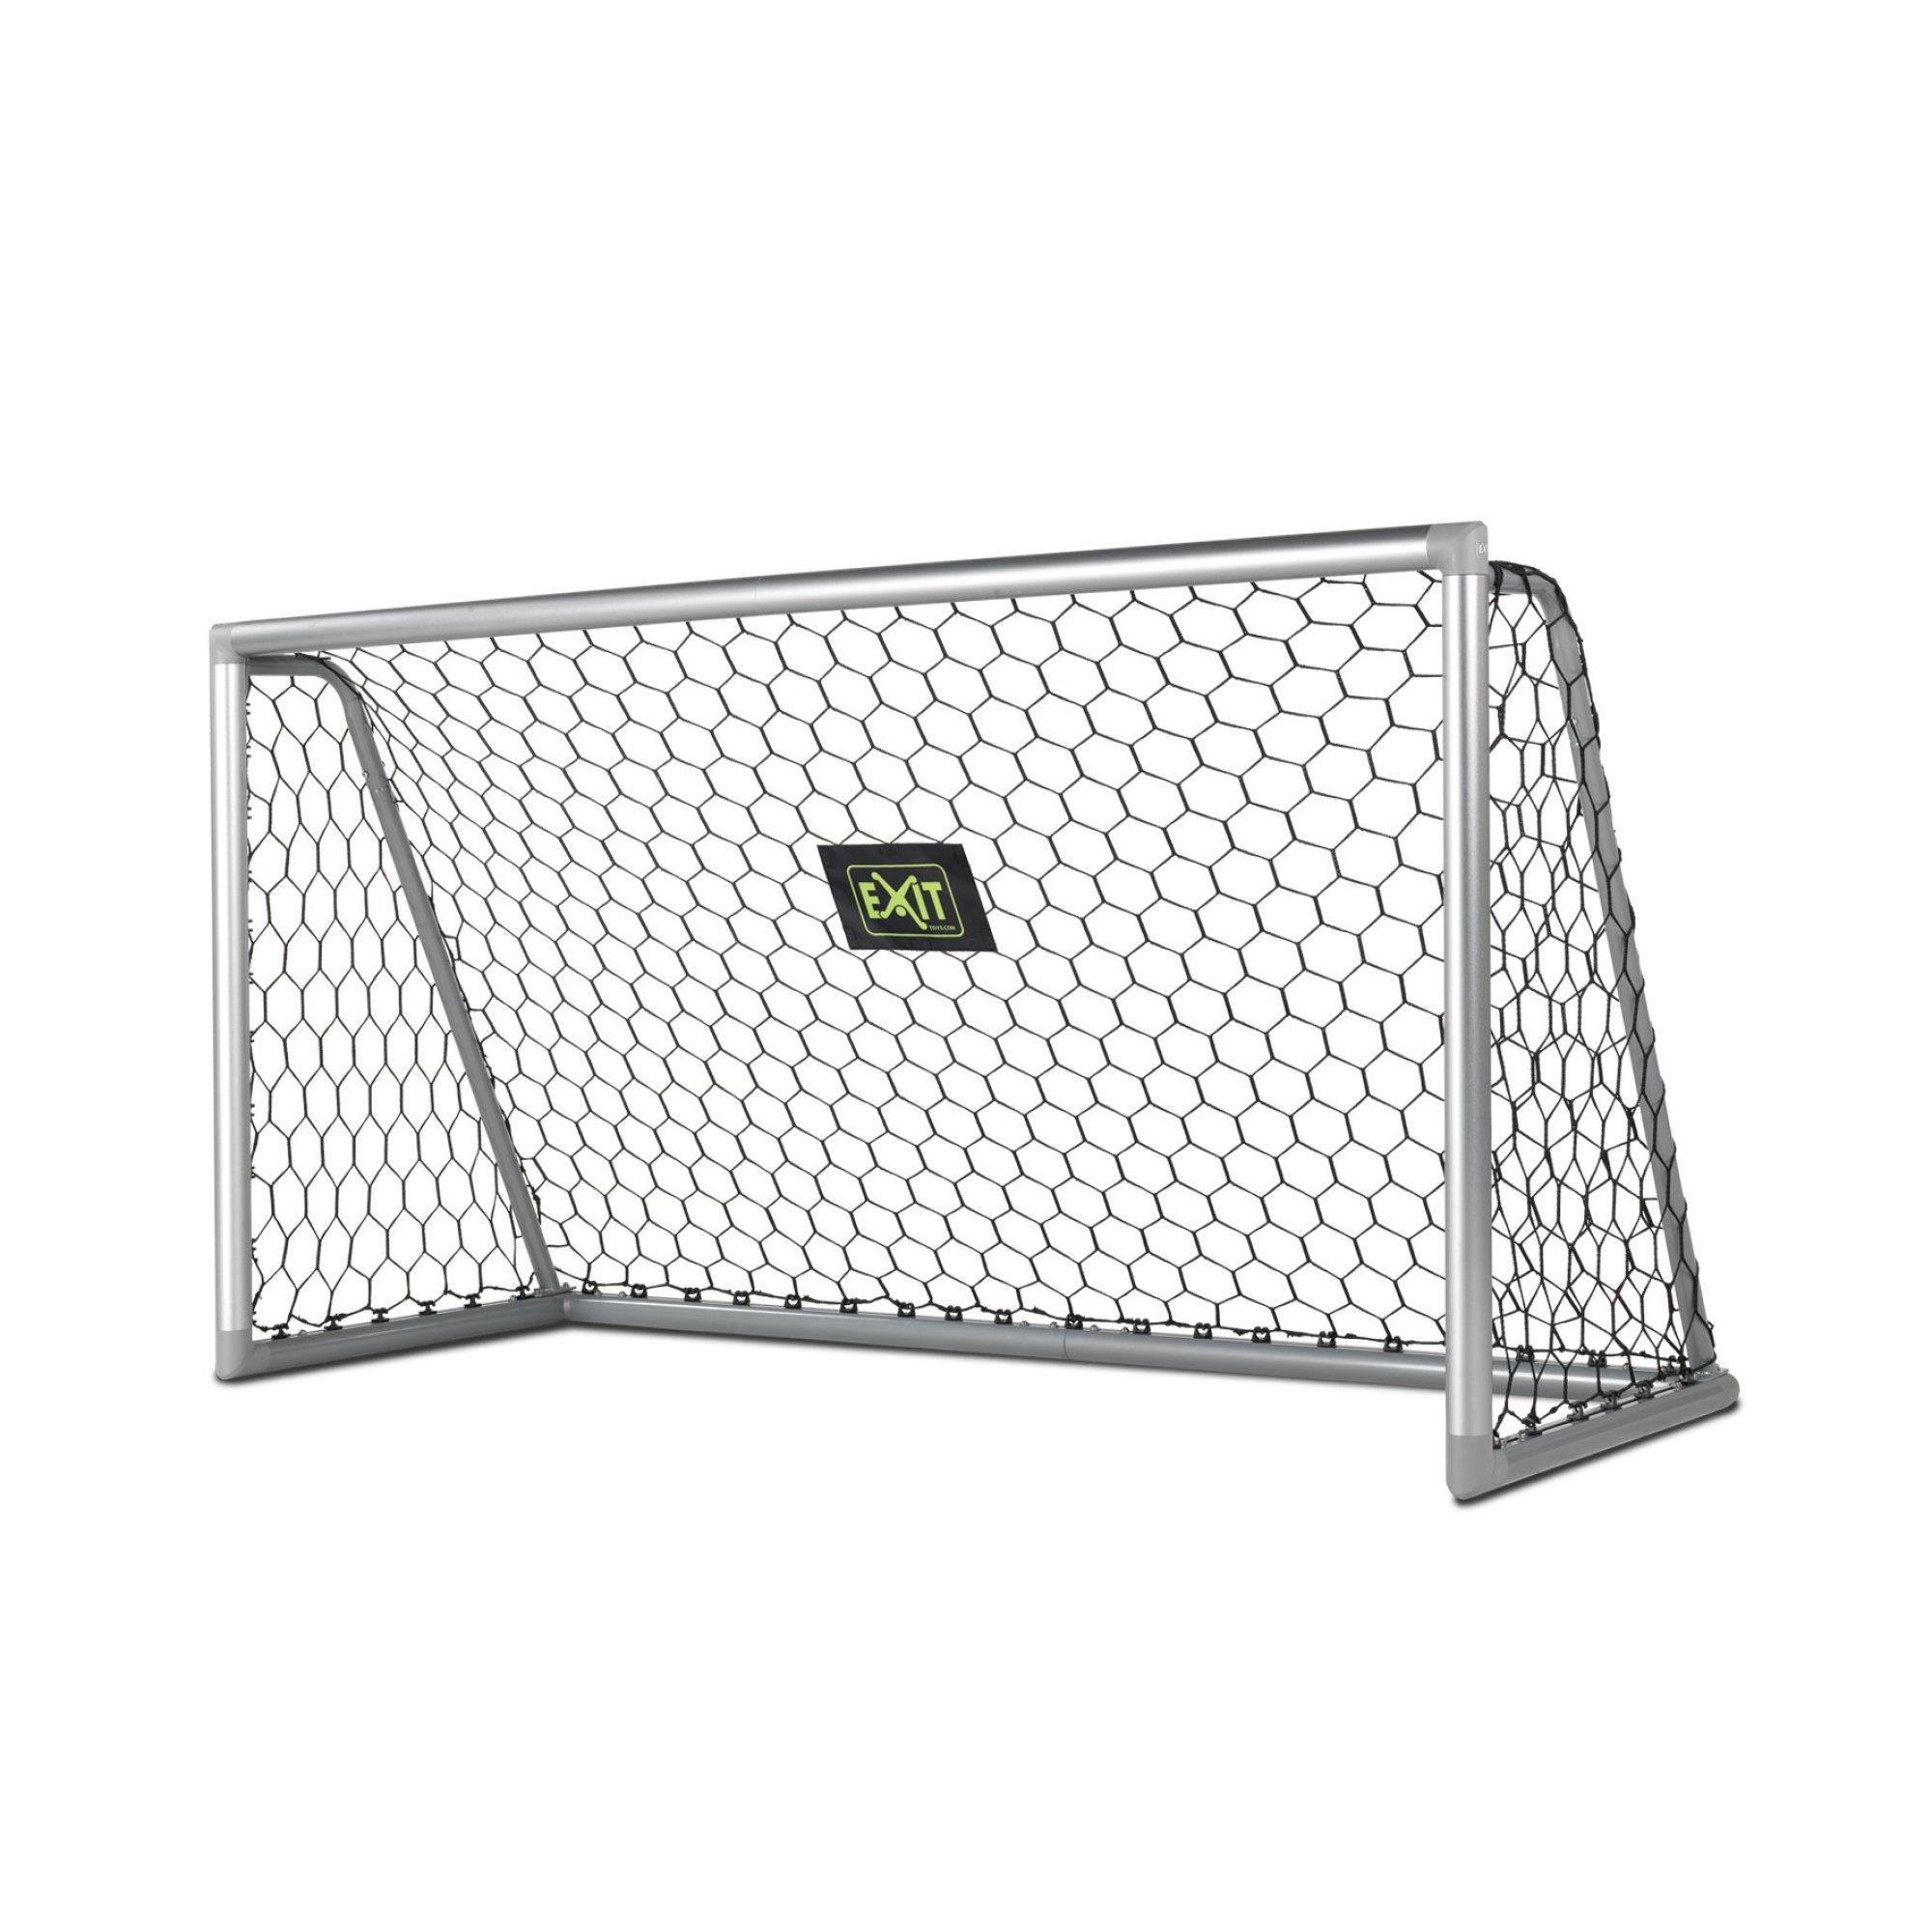 EXIT - Scala aluminium fodbold mål (220x120cm) (42.22.12.00)